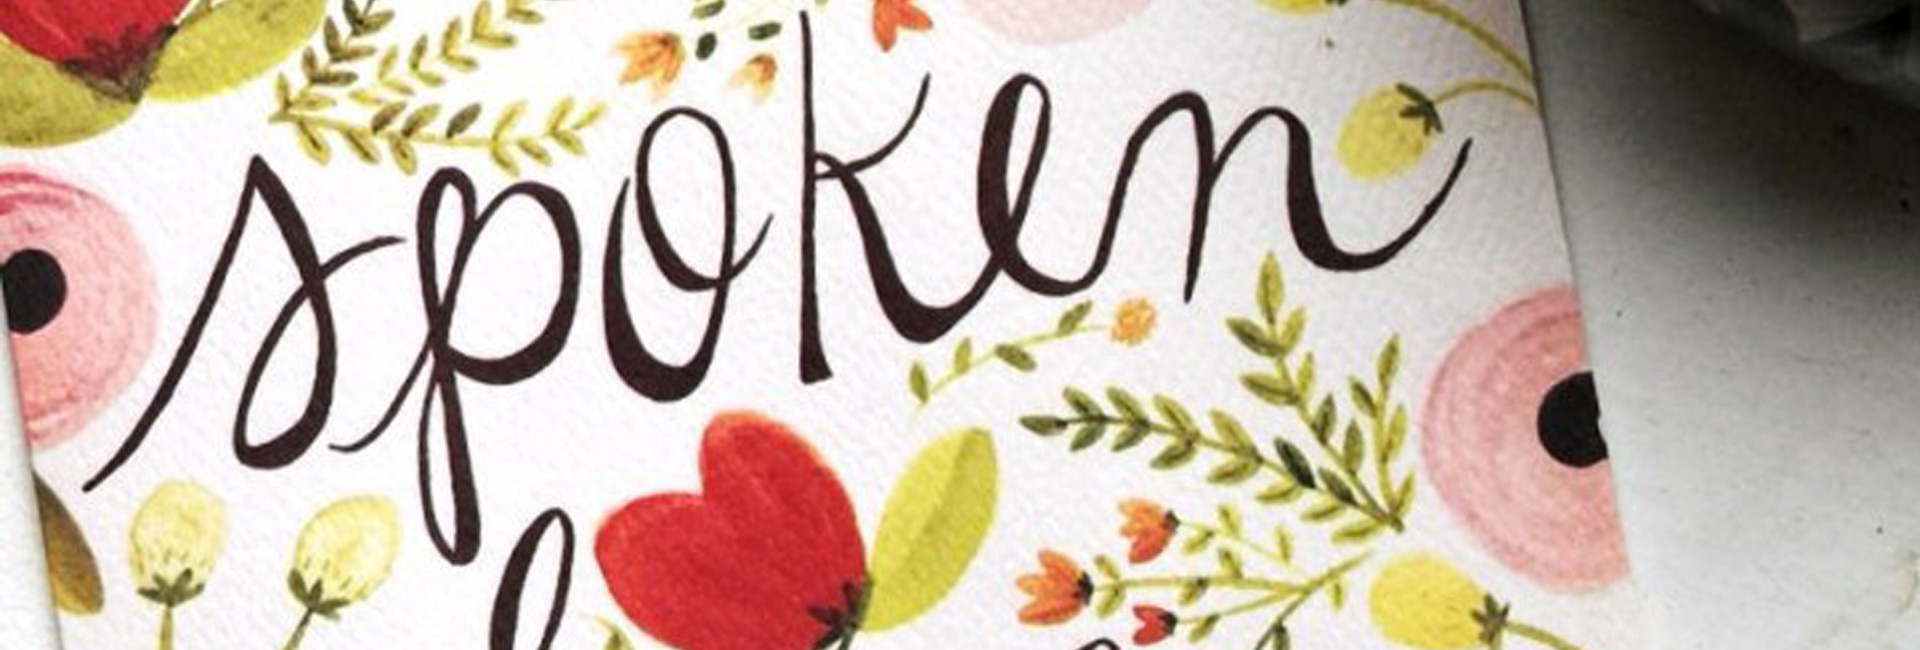 The Three Most Romantic Words